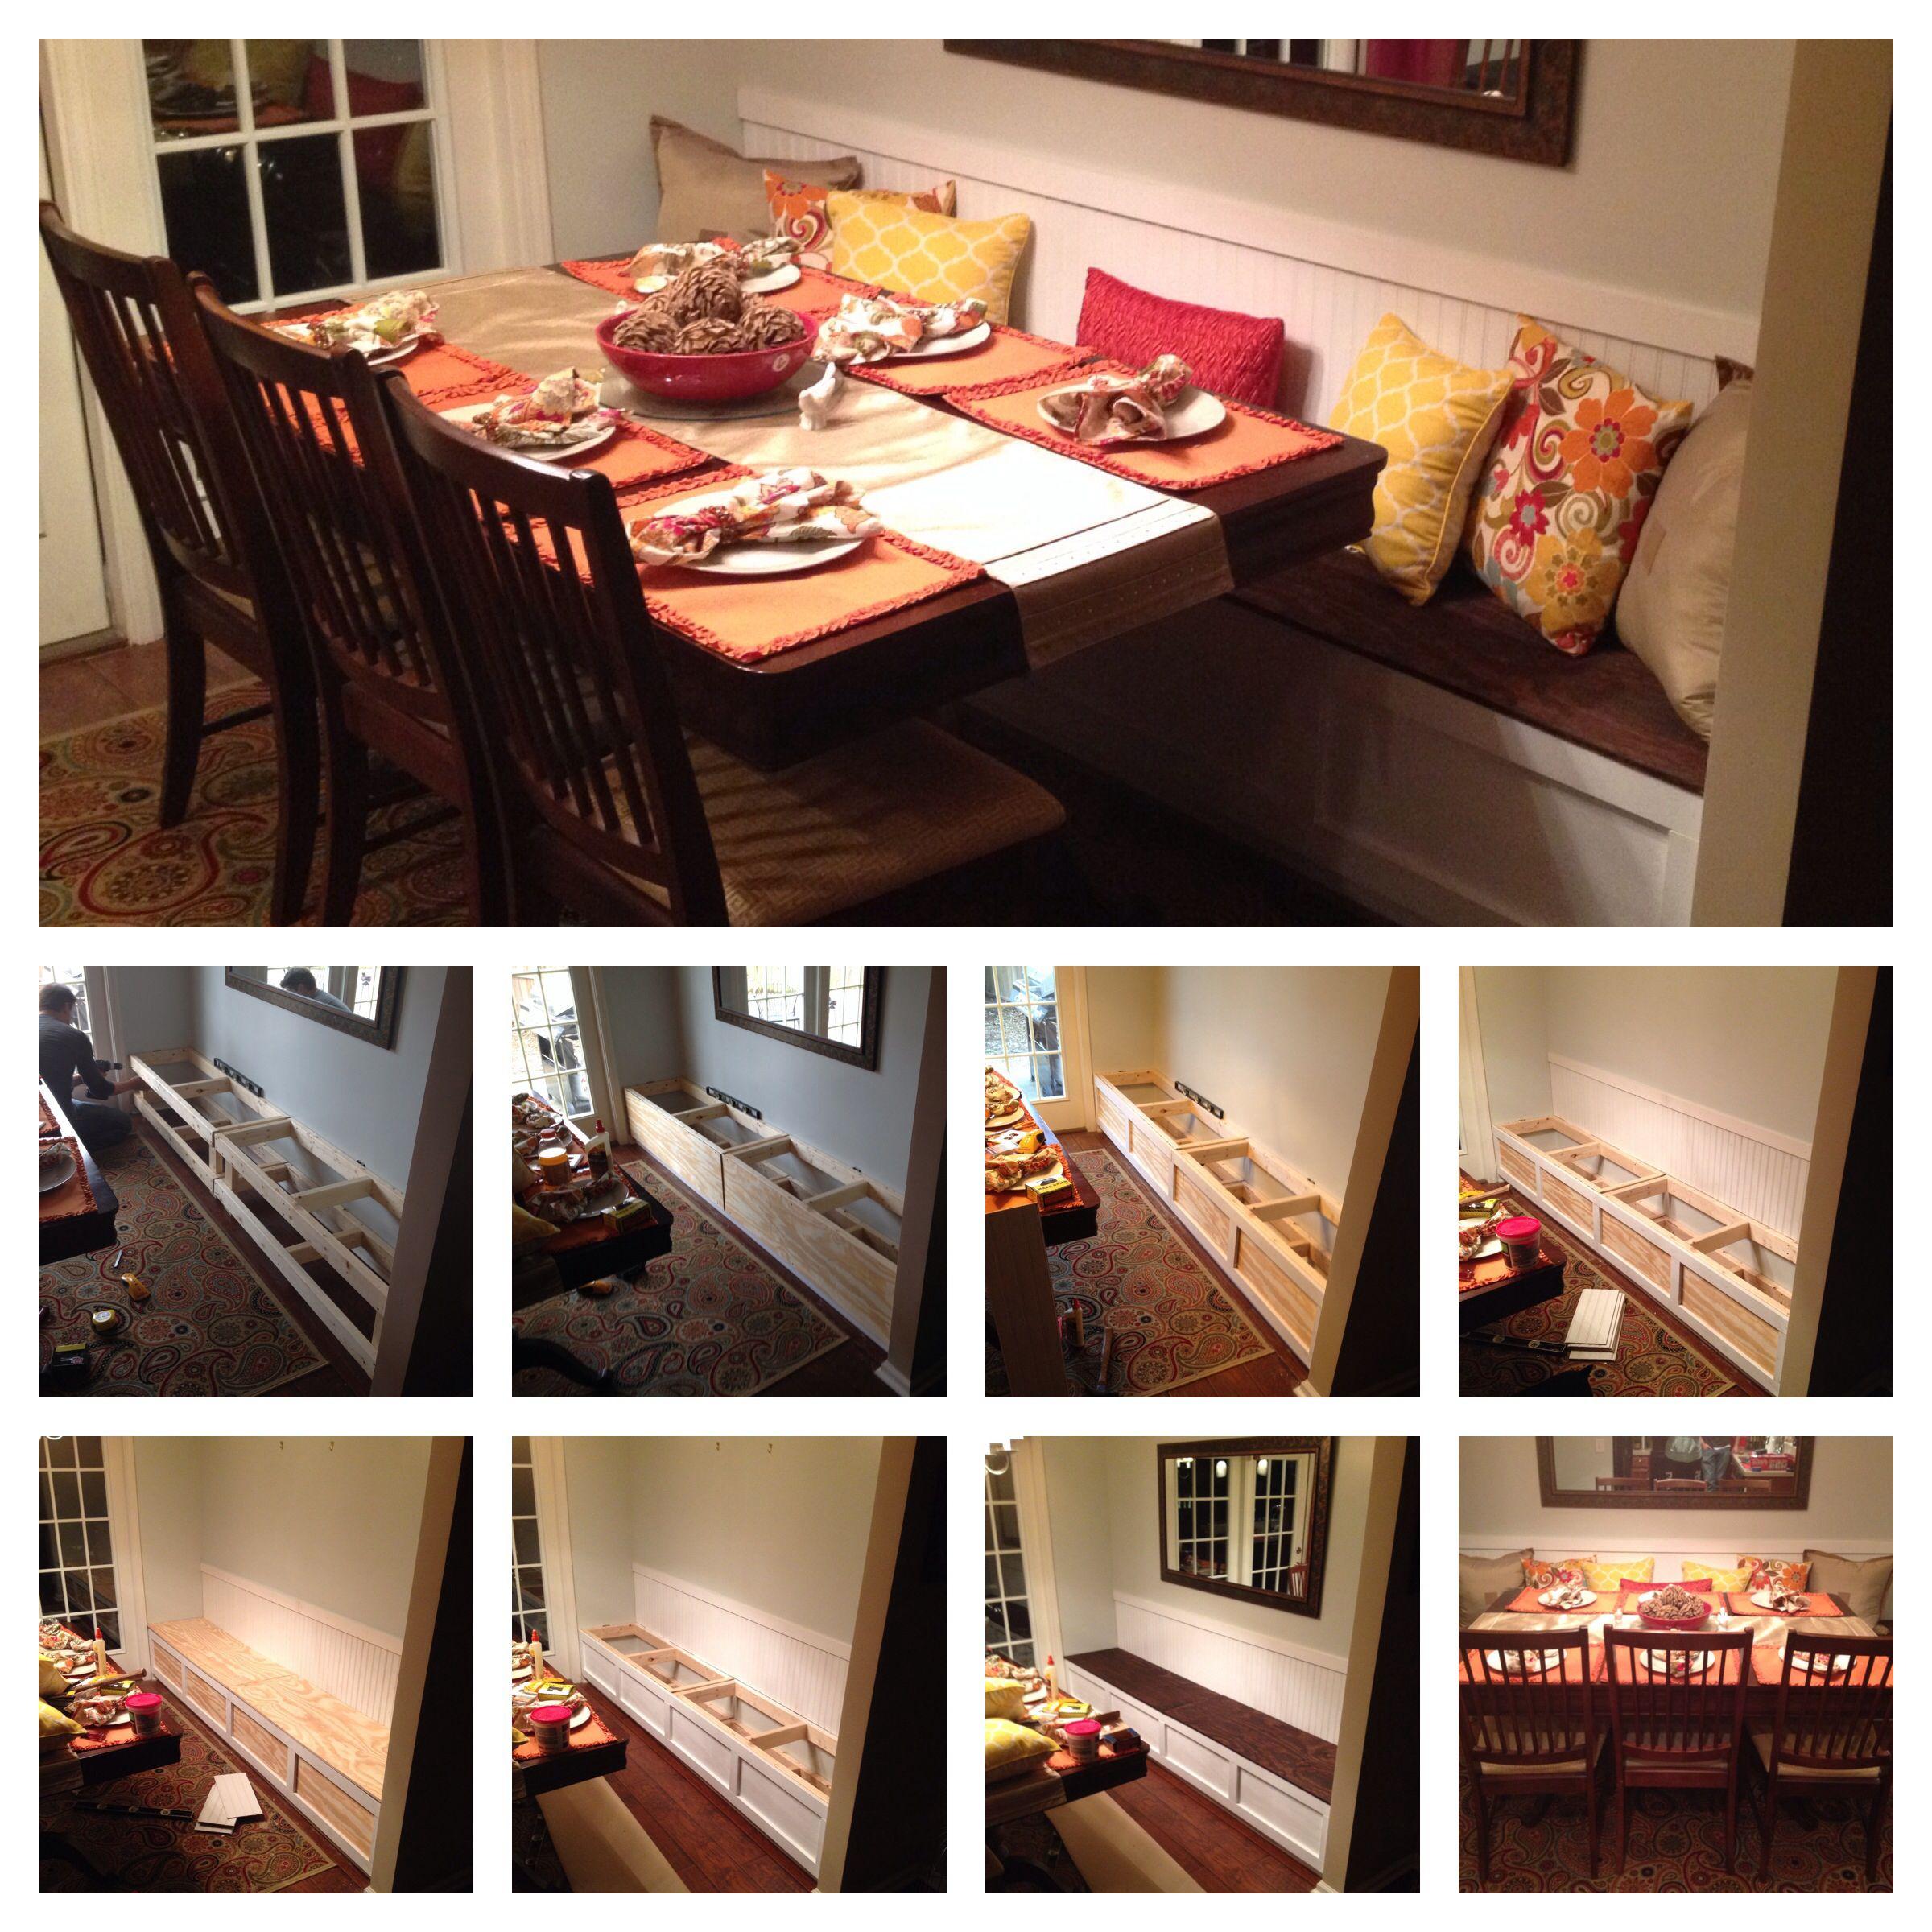 DIY Breakfast Nook Banquette Small Dining Room IdeasTotal Cost 100